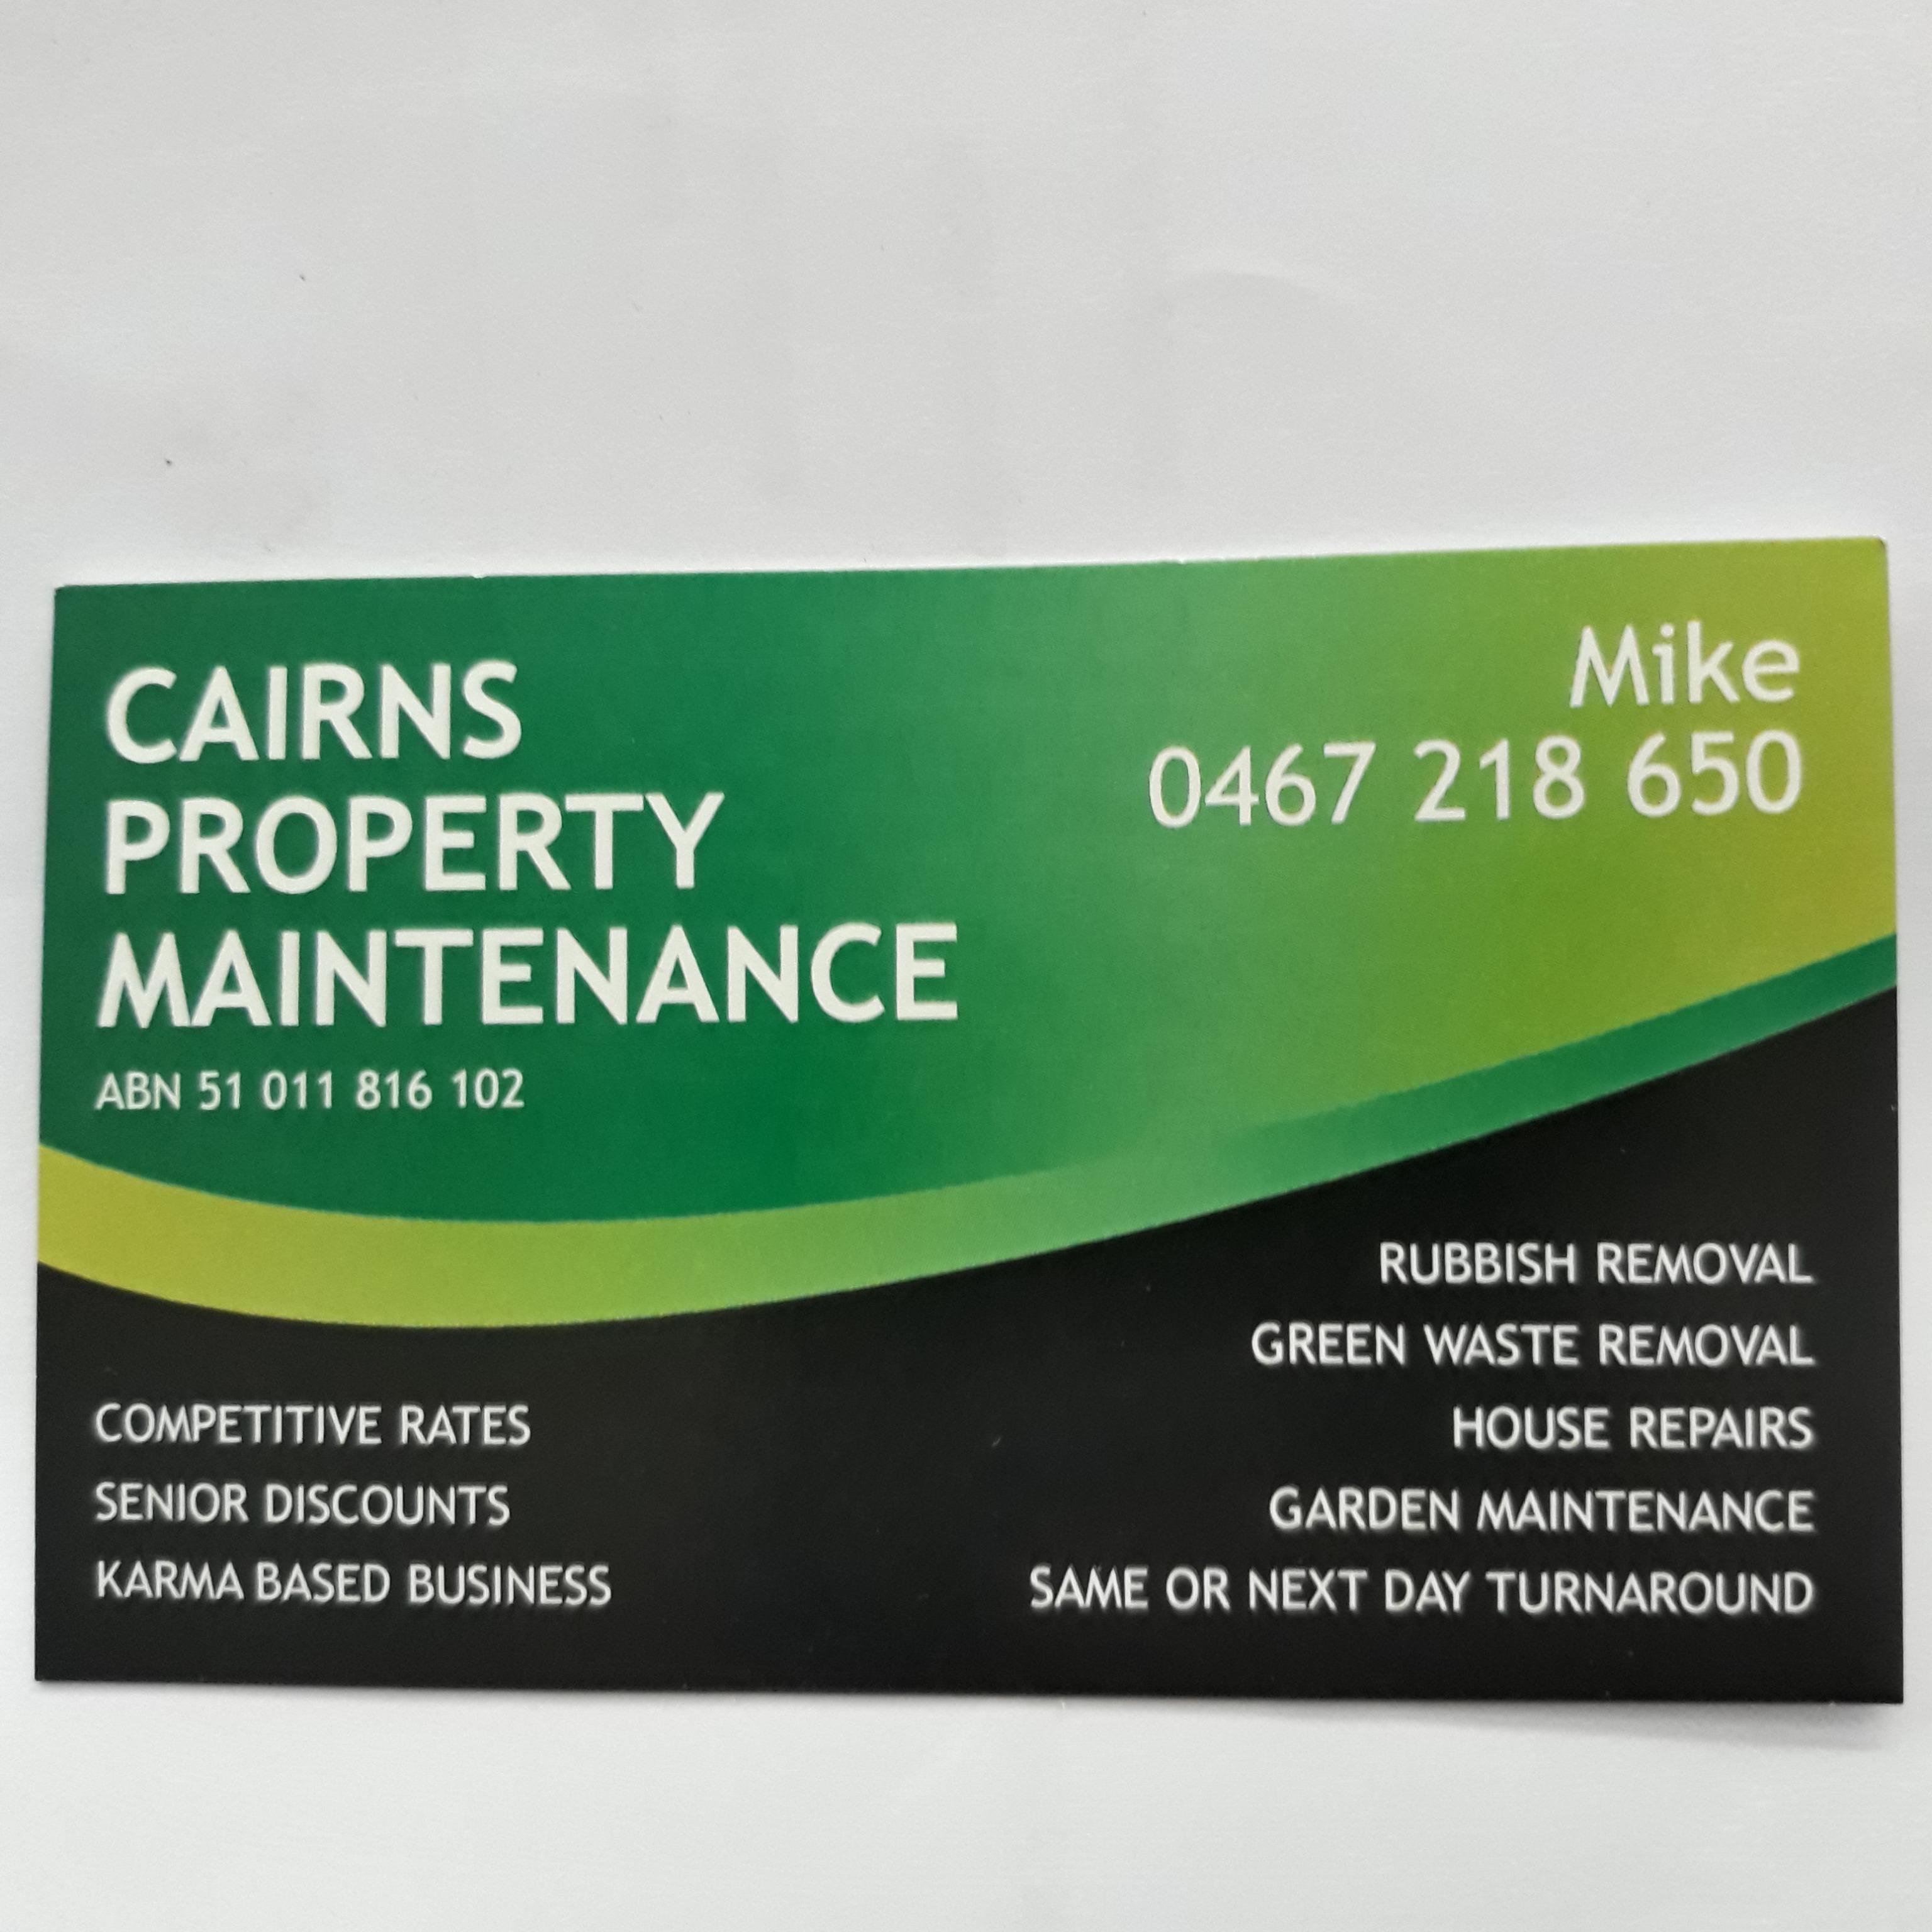 Cairns Property Maintenance